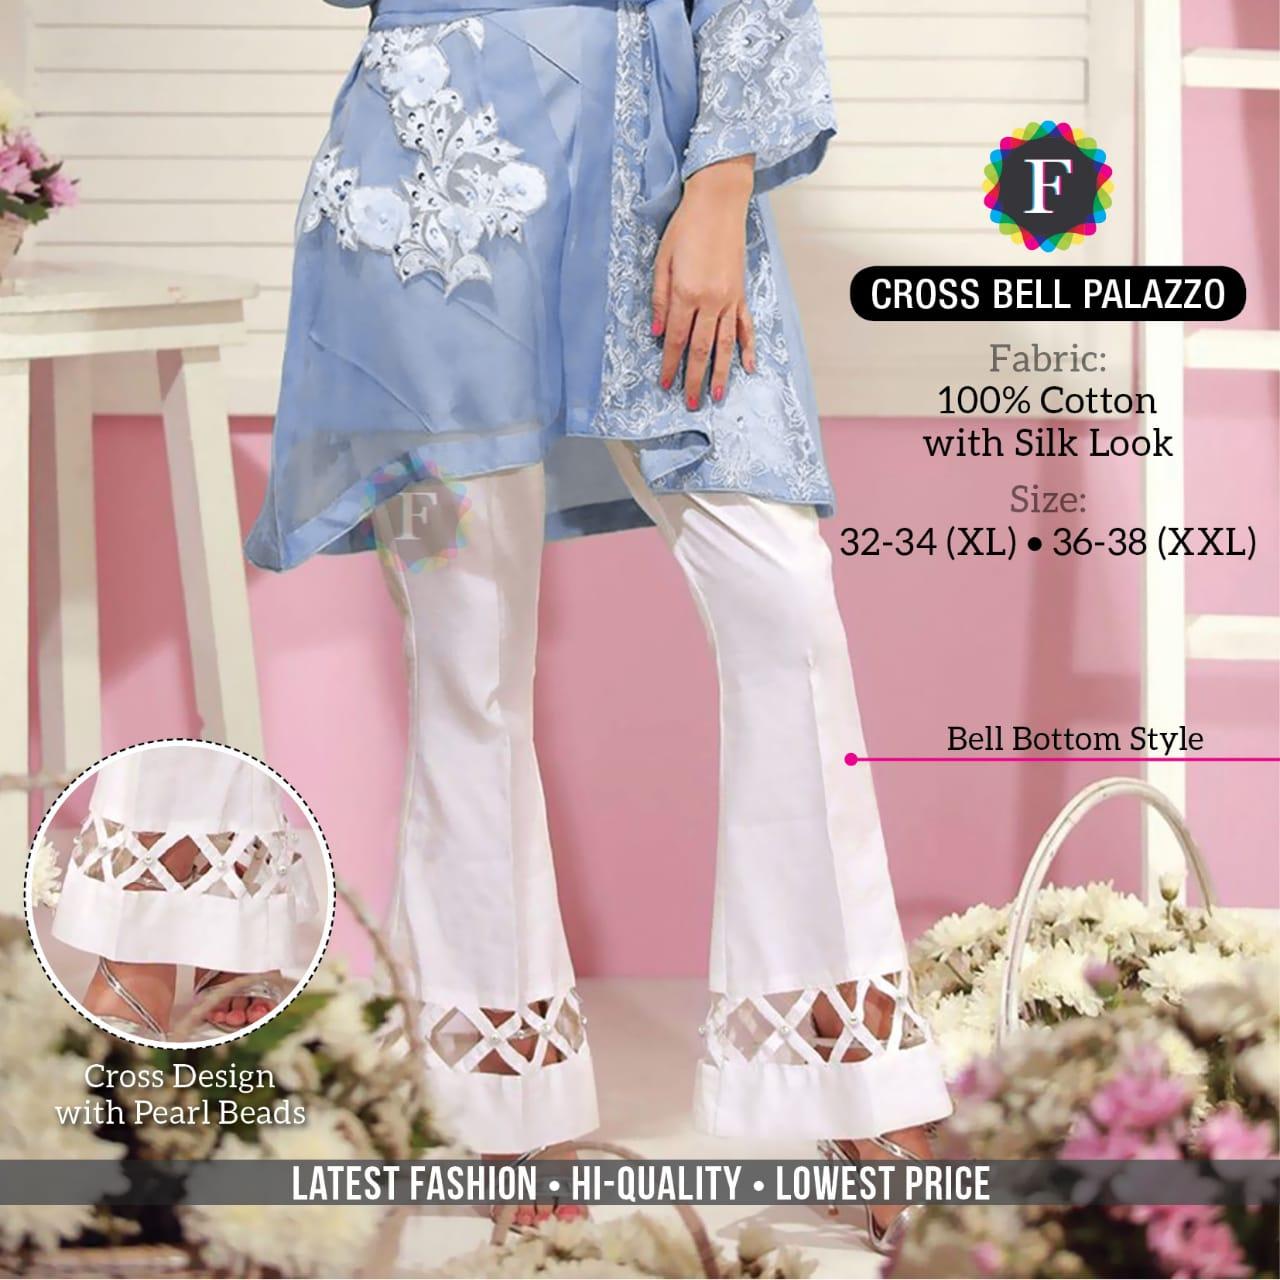 Cross Bell Palazzo Cotton Festive Season Summer Special Bottom Wear